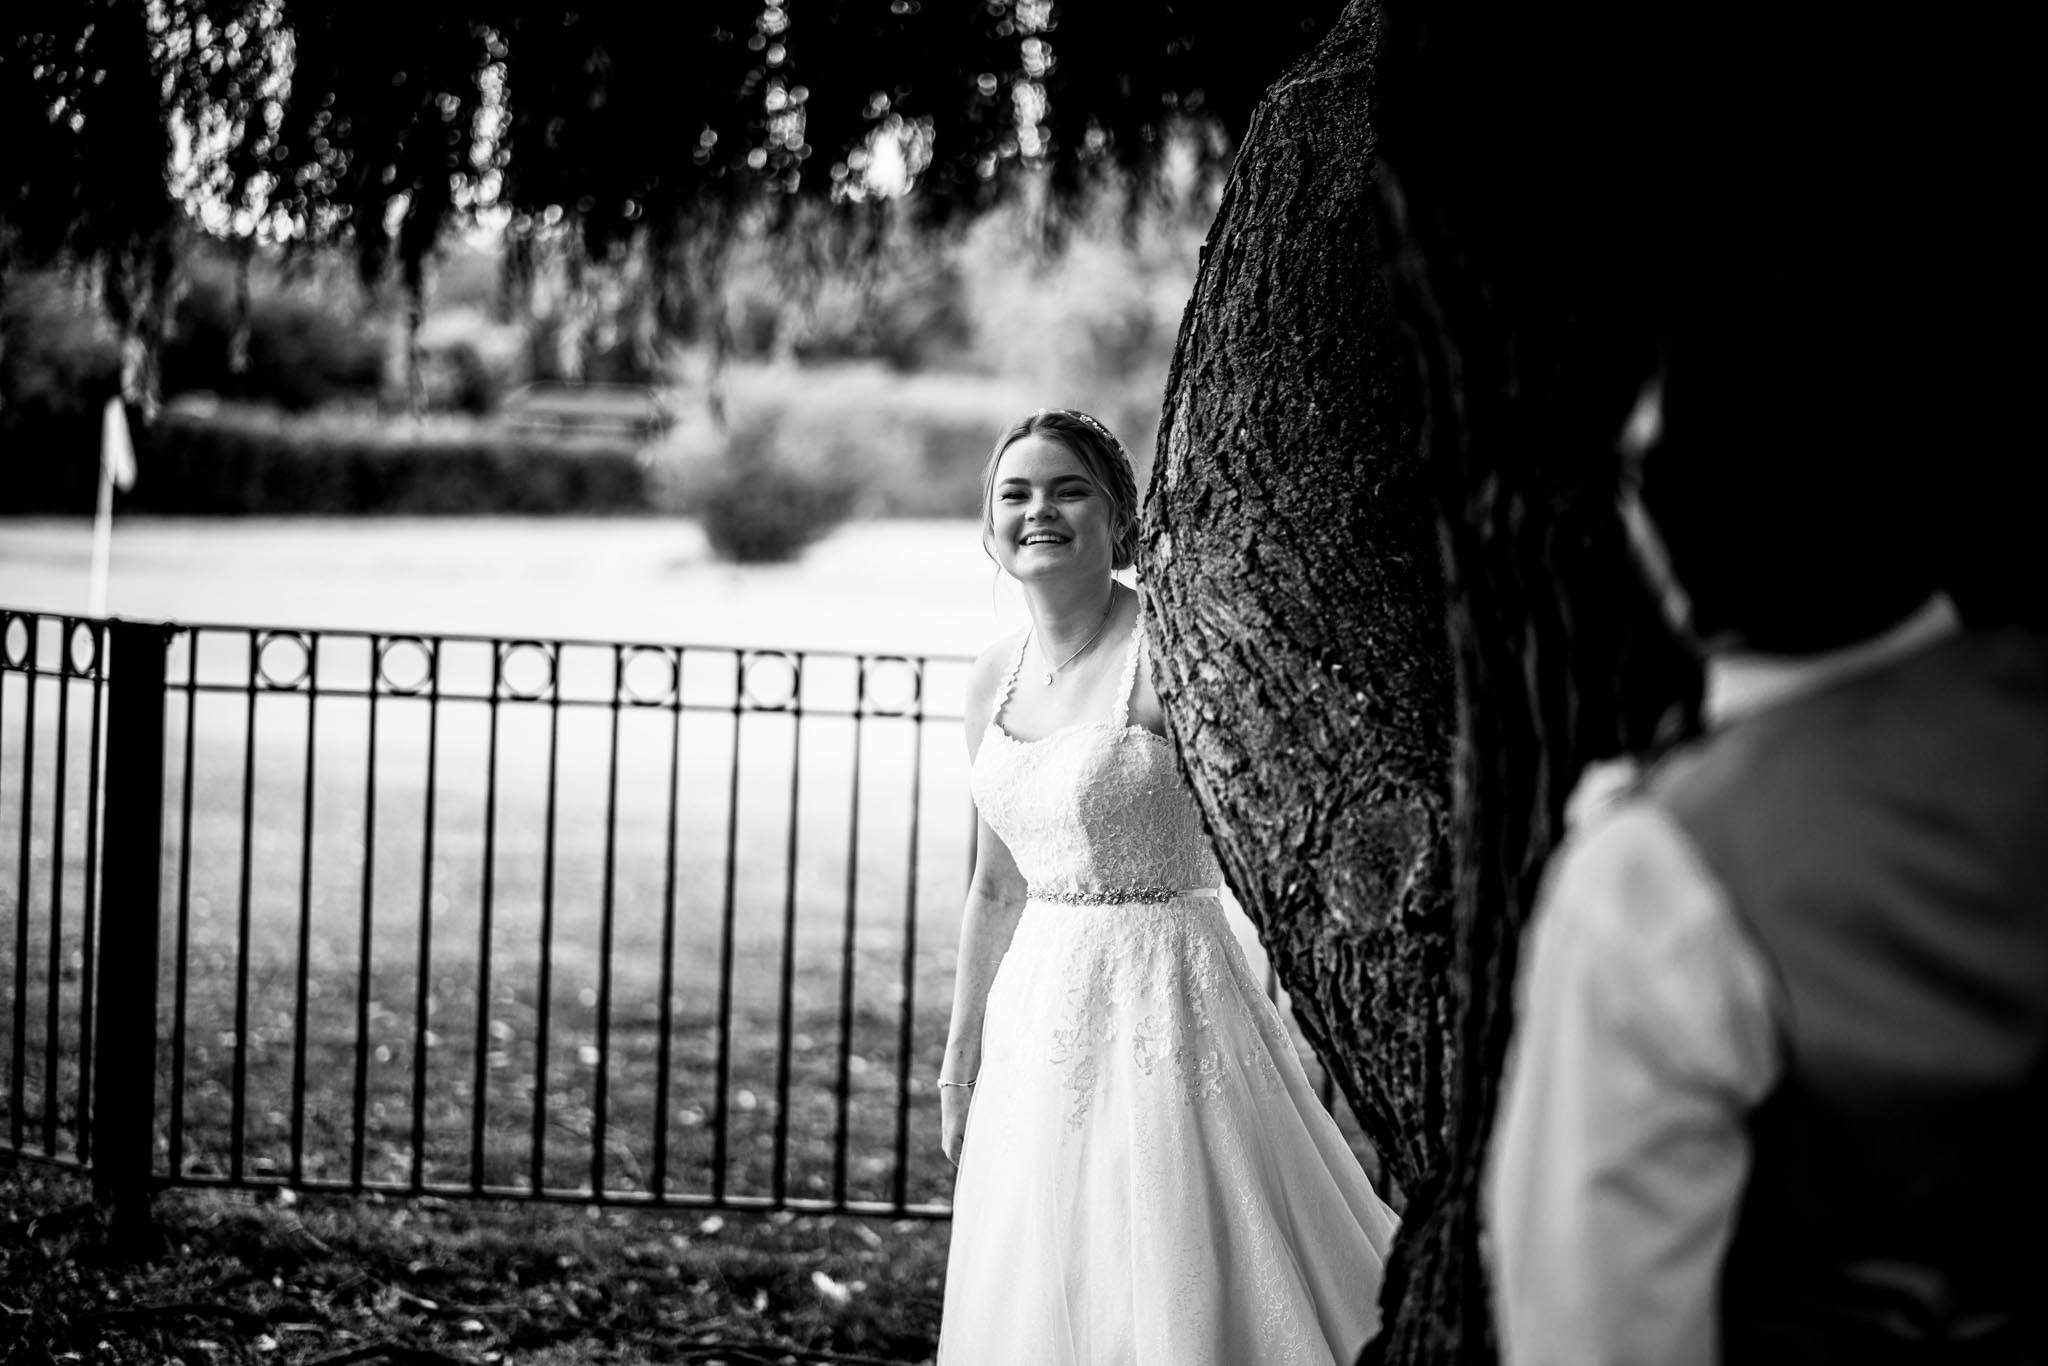 598-Bride-groom-Luke-Yasmin-The-Rayleigh-Club-Wedding-Photography.jpg